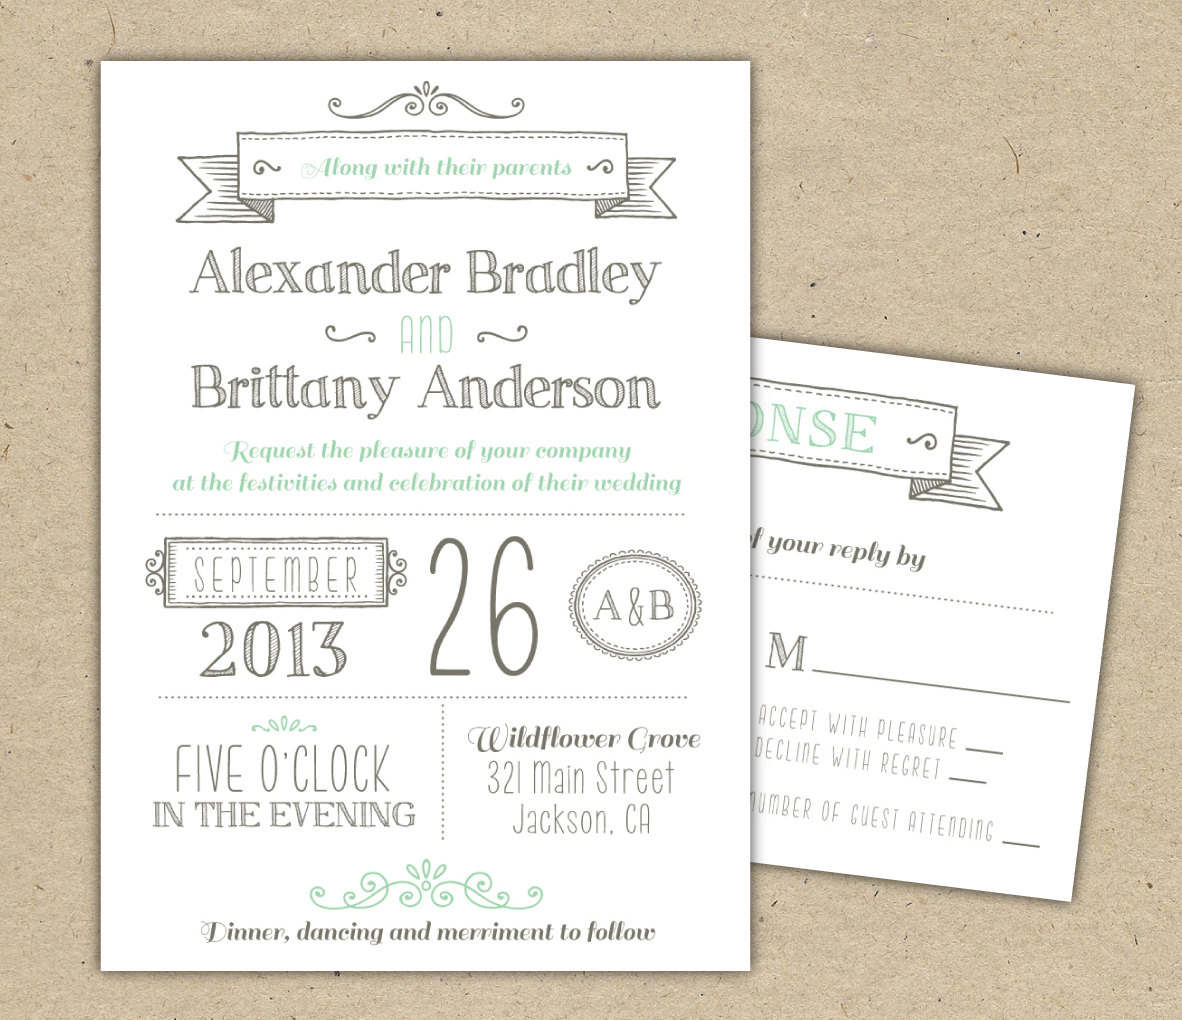 Wedding Invites Templates Free Printable Wedding Invitations - Free Printable Wedding Invitations